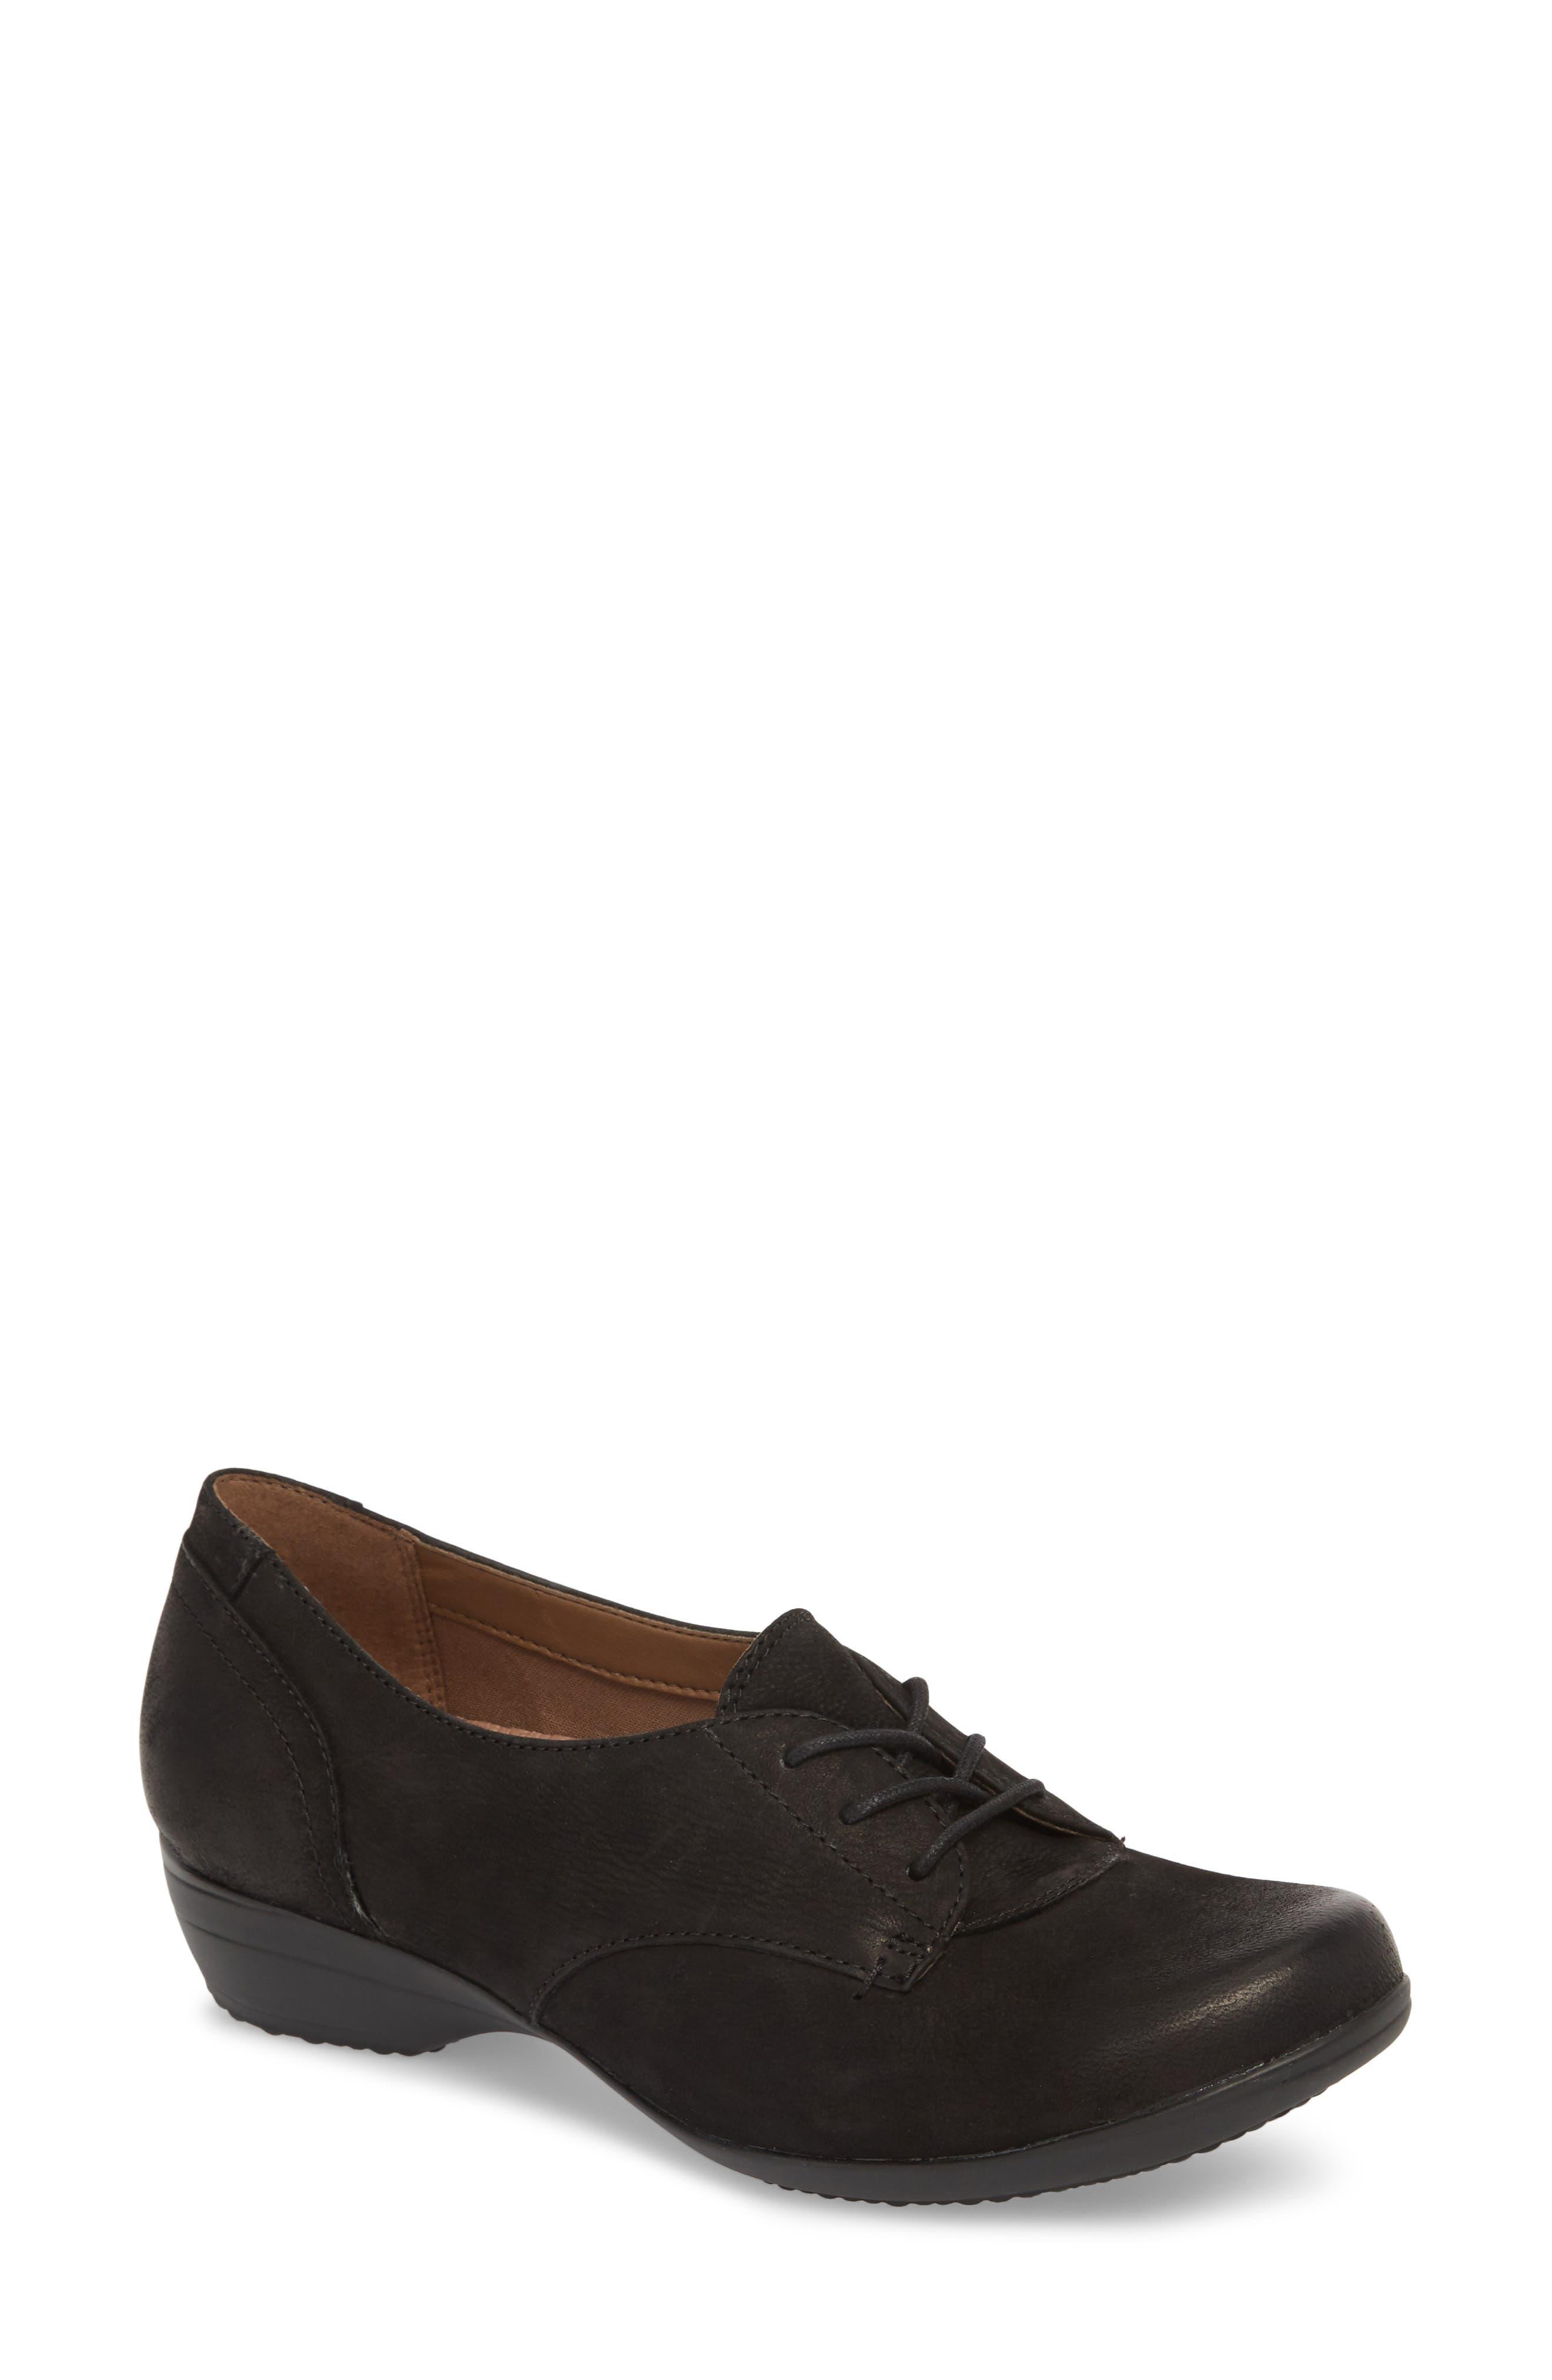 Fallon Derby,                         Main,                         color, Black Burnished Nubuck Leather